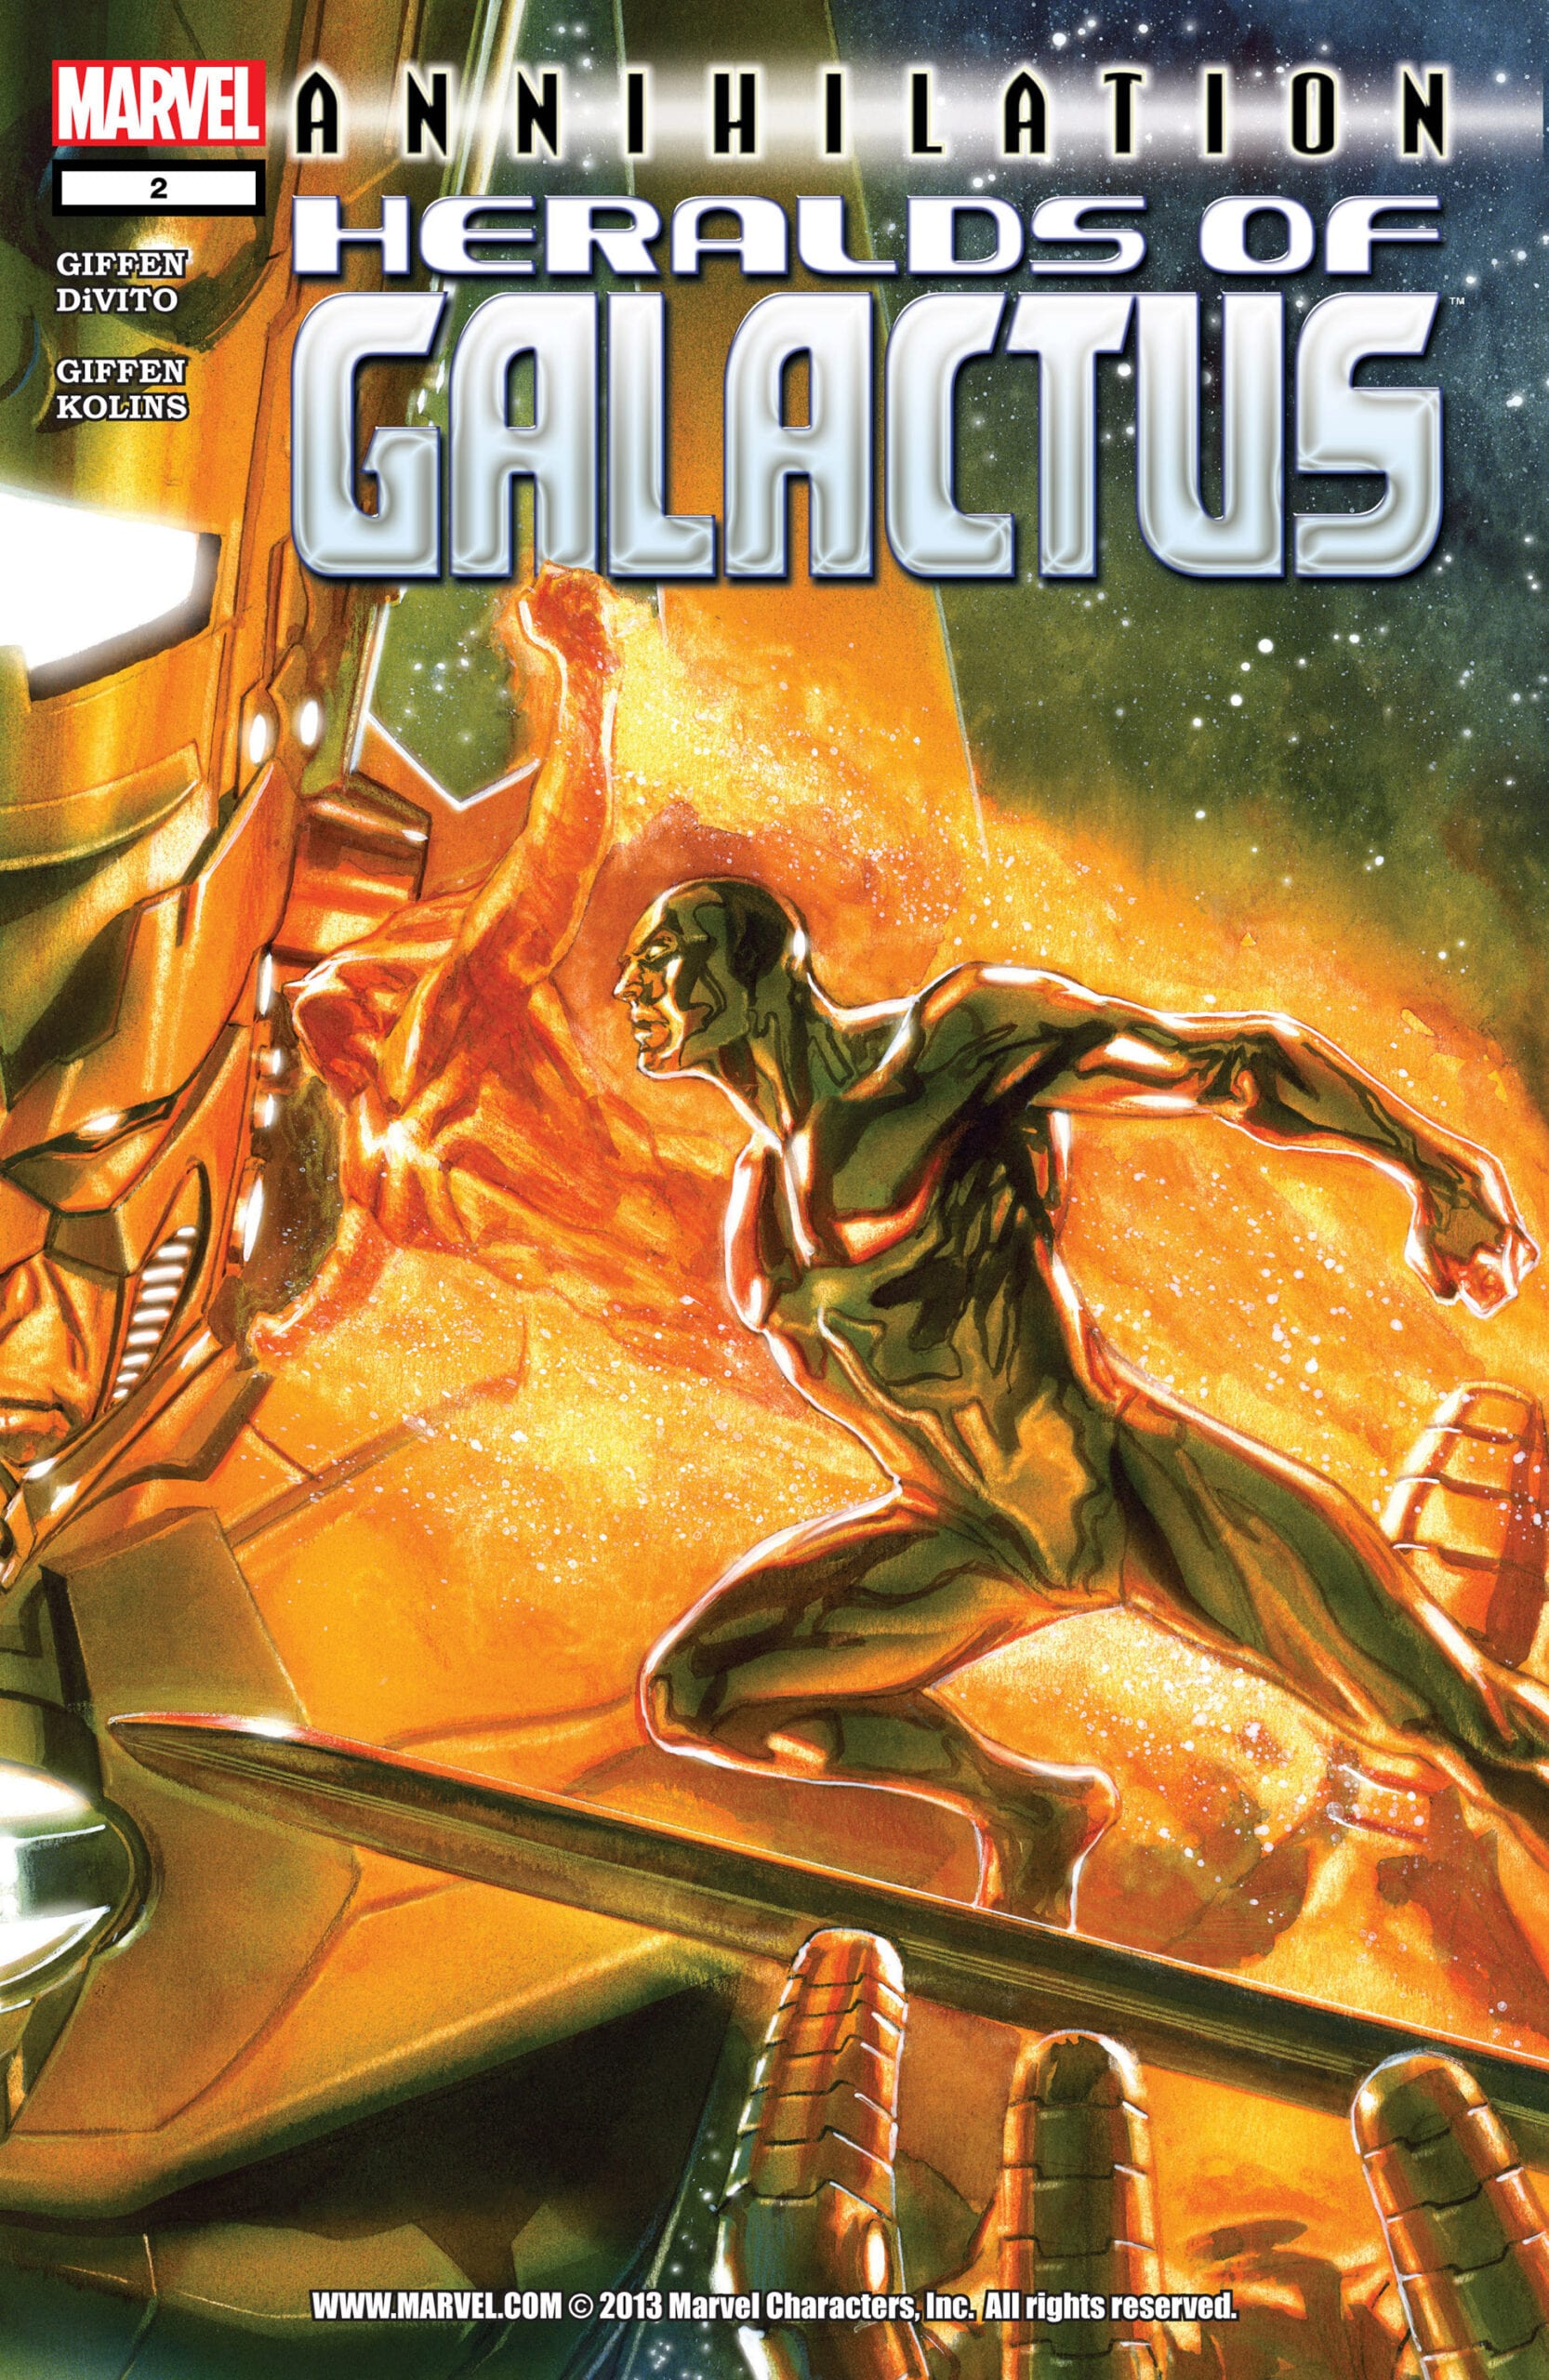 Comic completo Annihilation: Heralds of Galactus